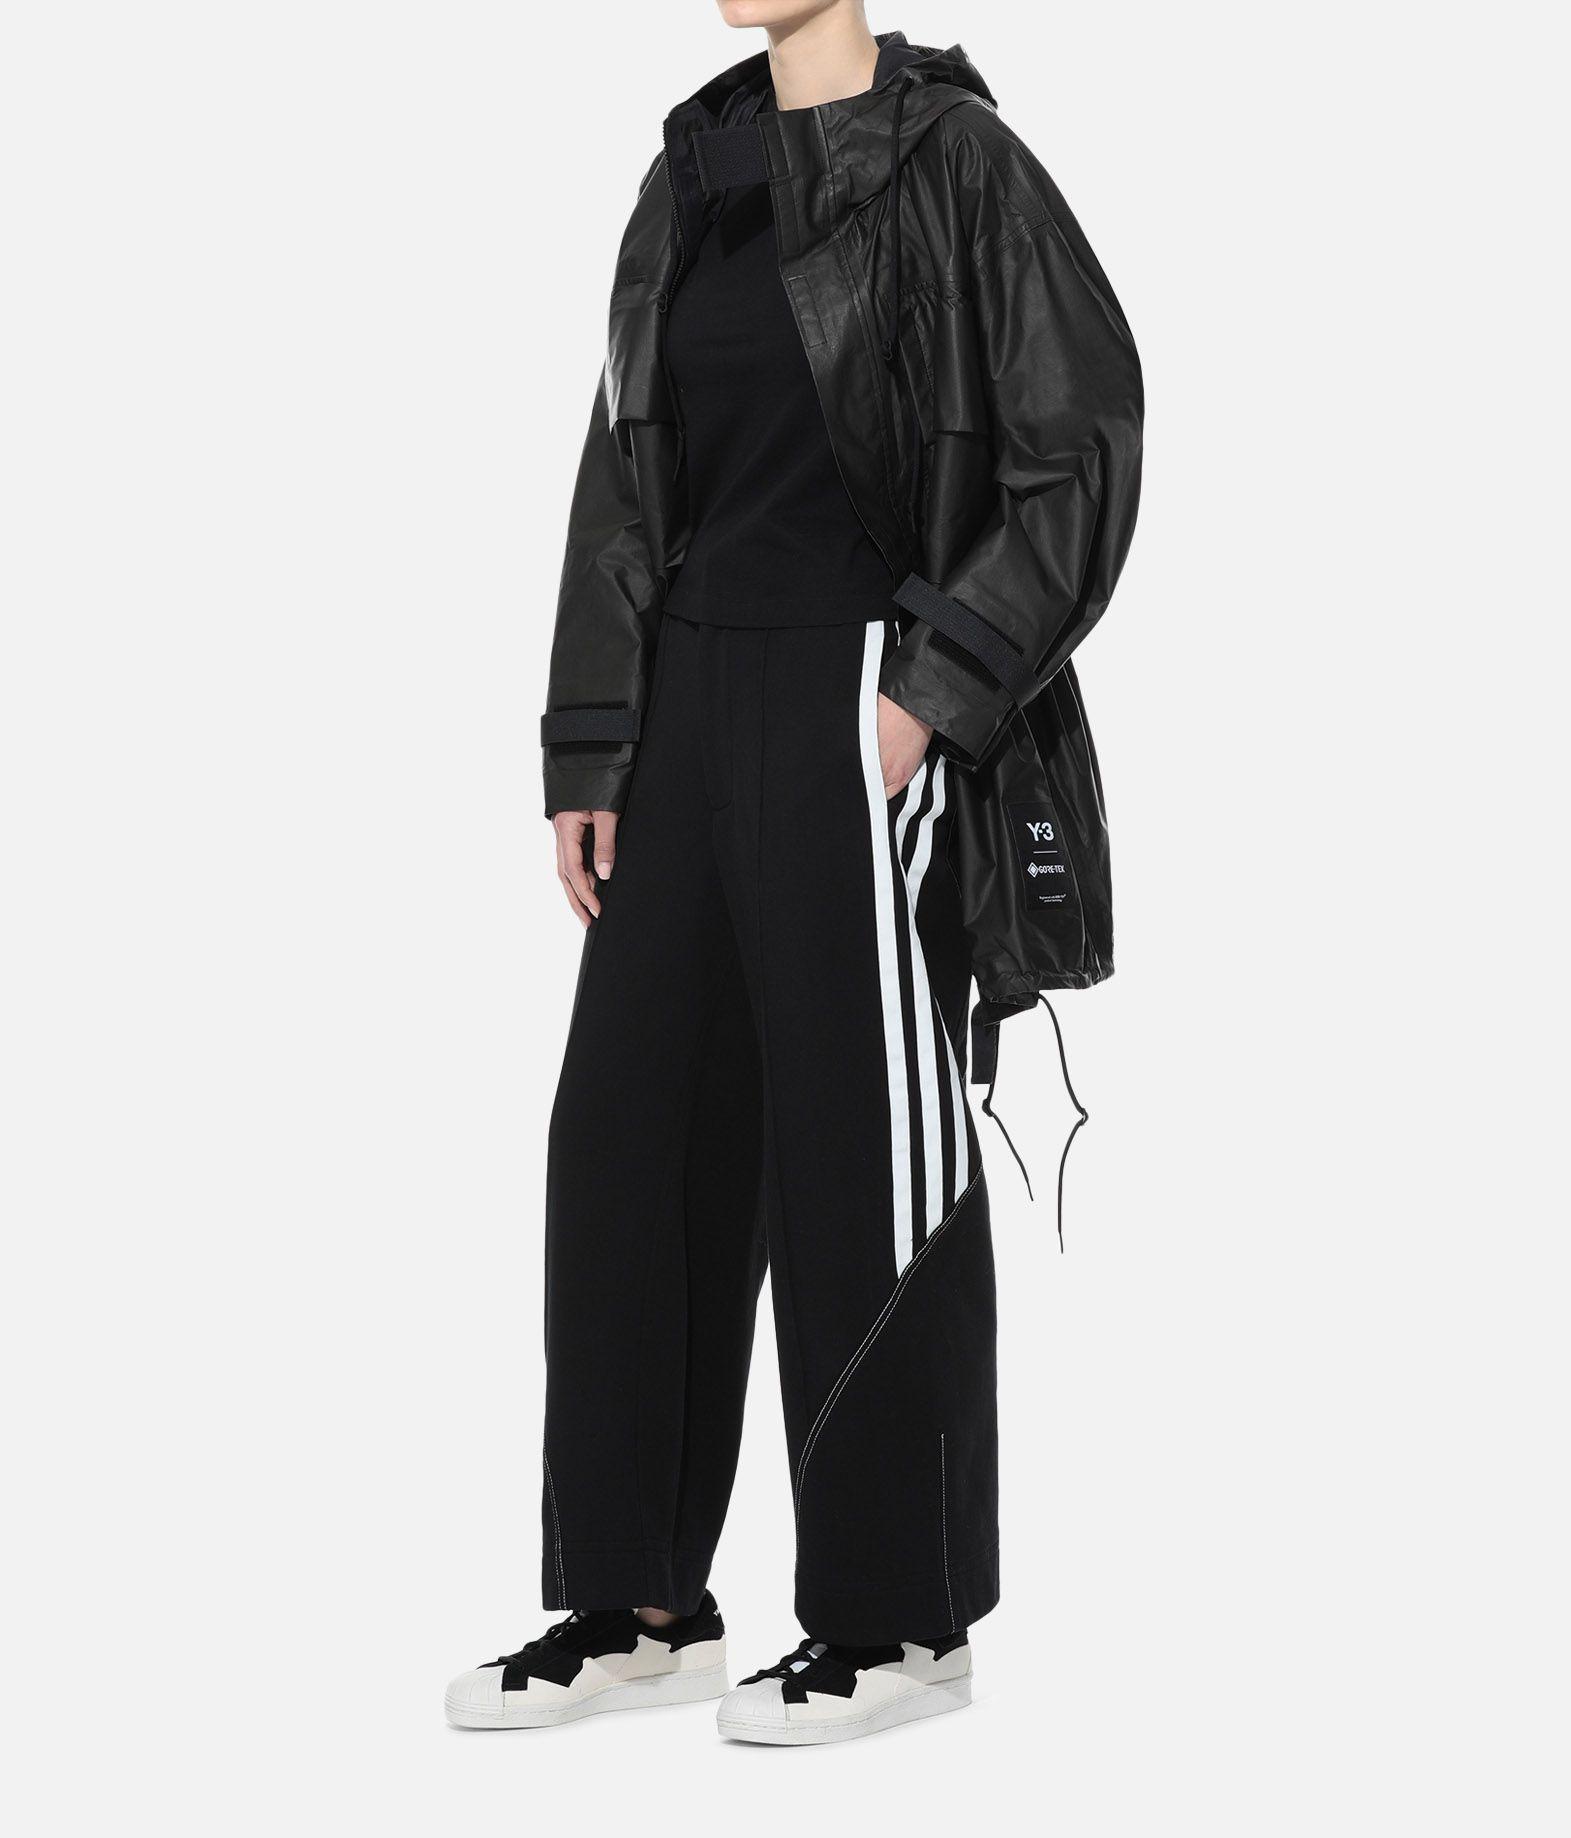 Y-3 Y-3 GORE-TEX Utility Hoodie Jacket Jacket Woman a